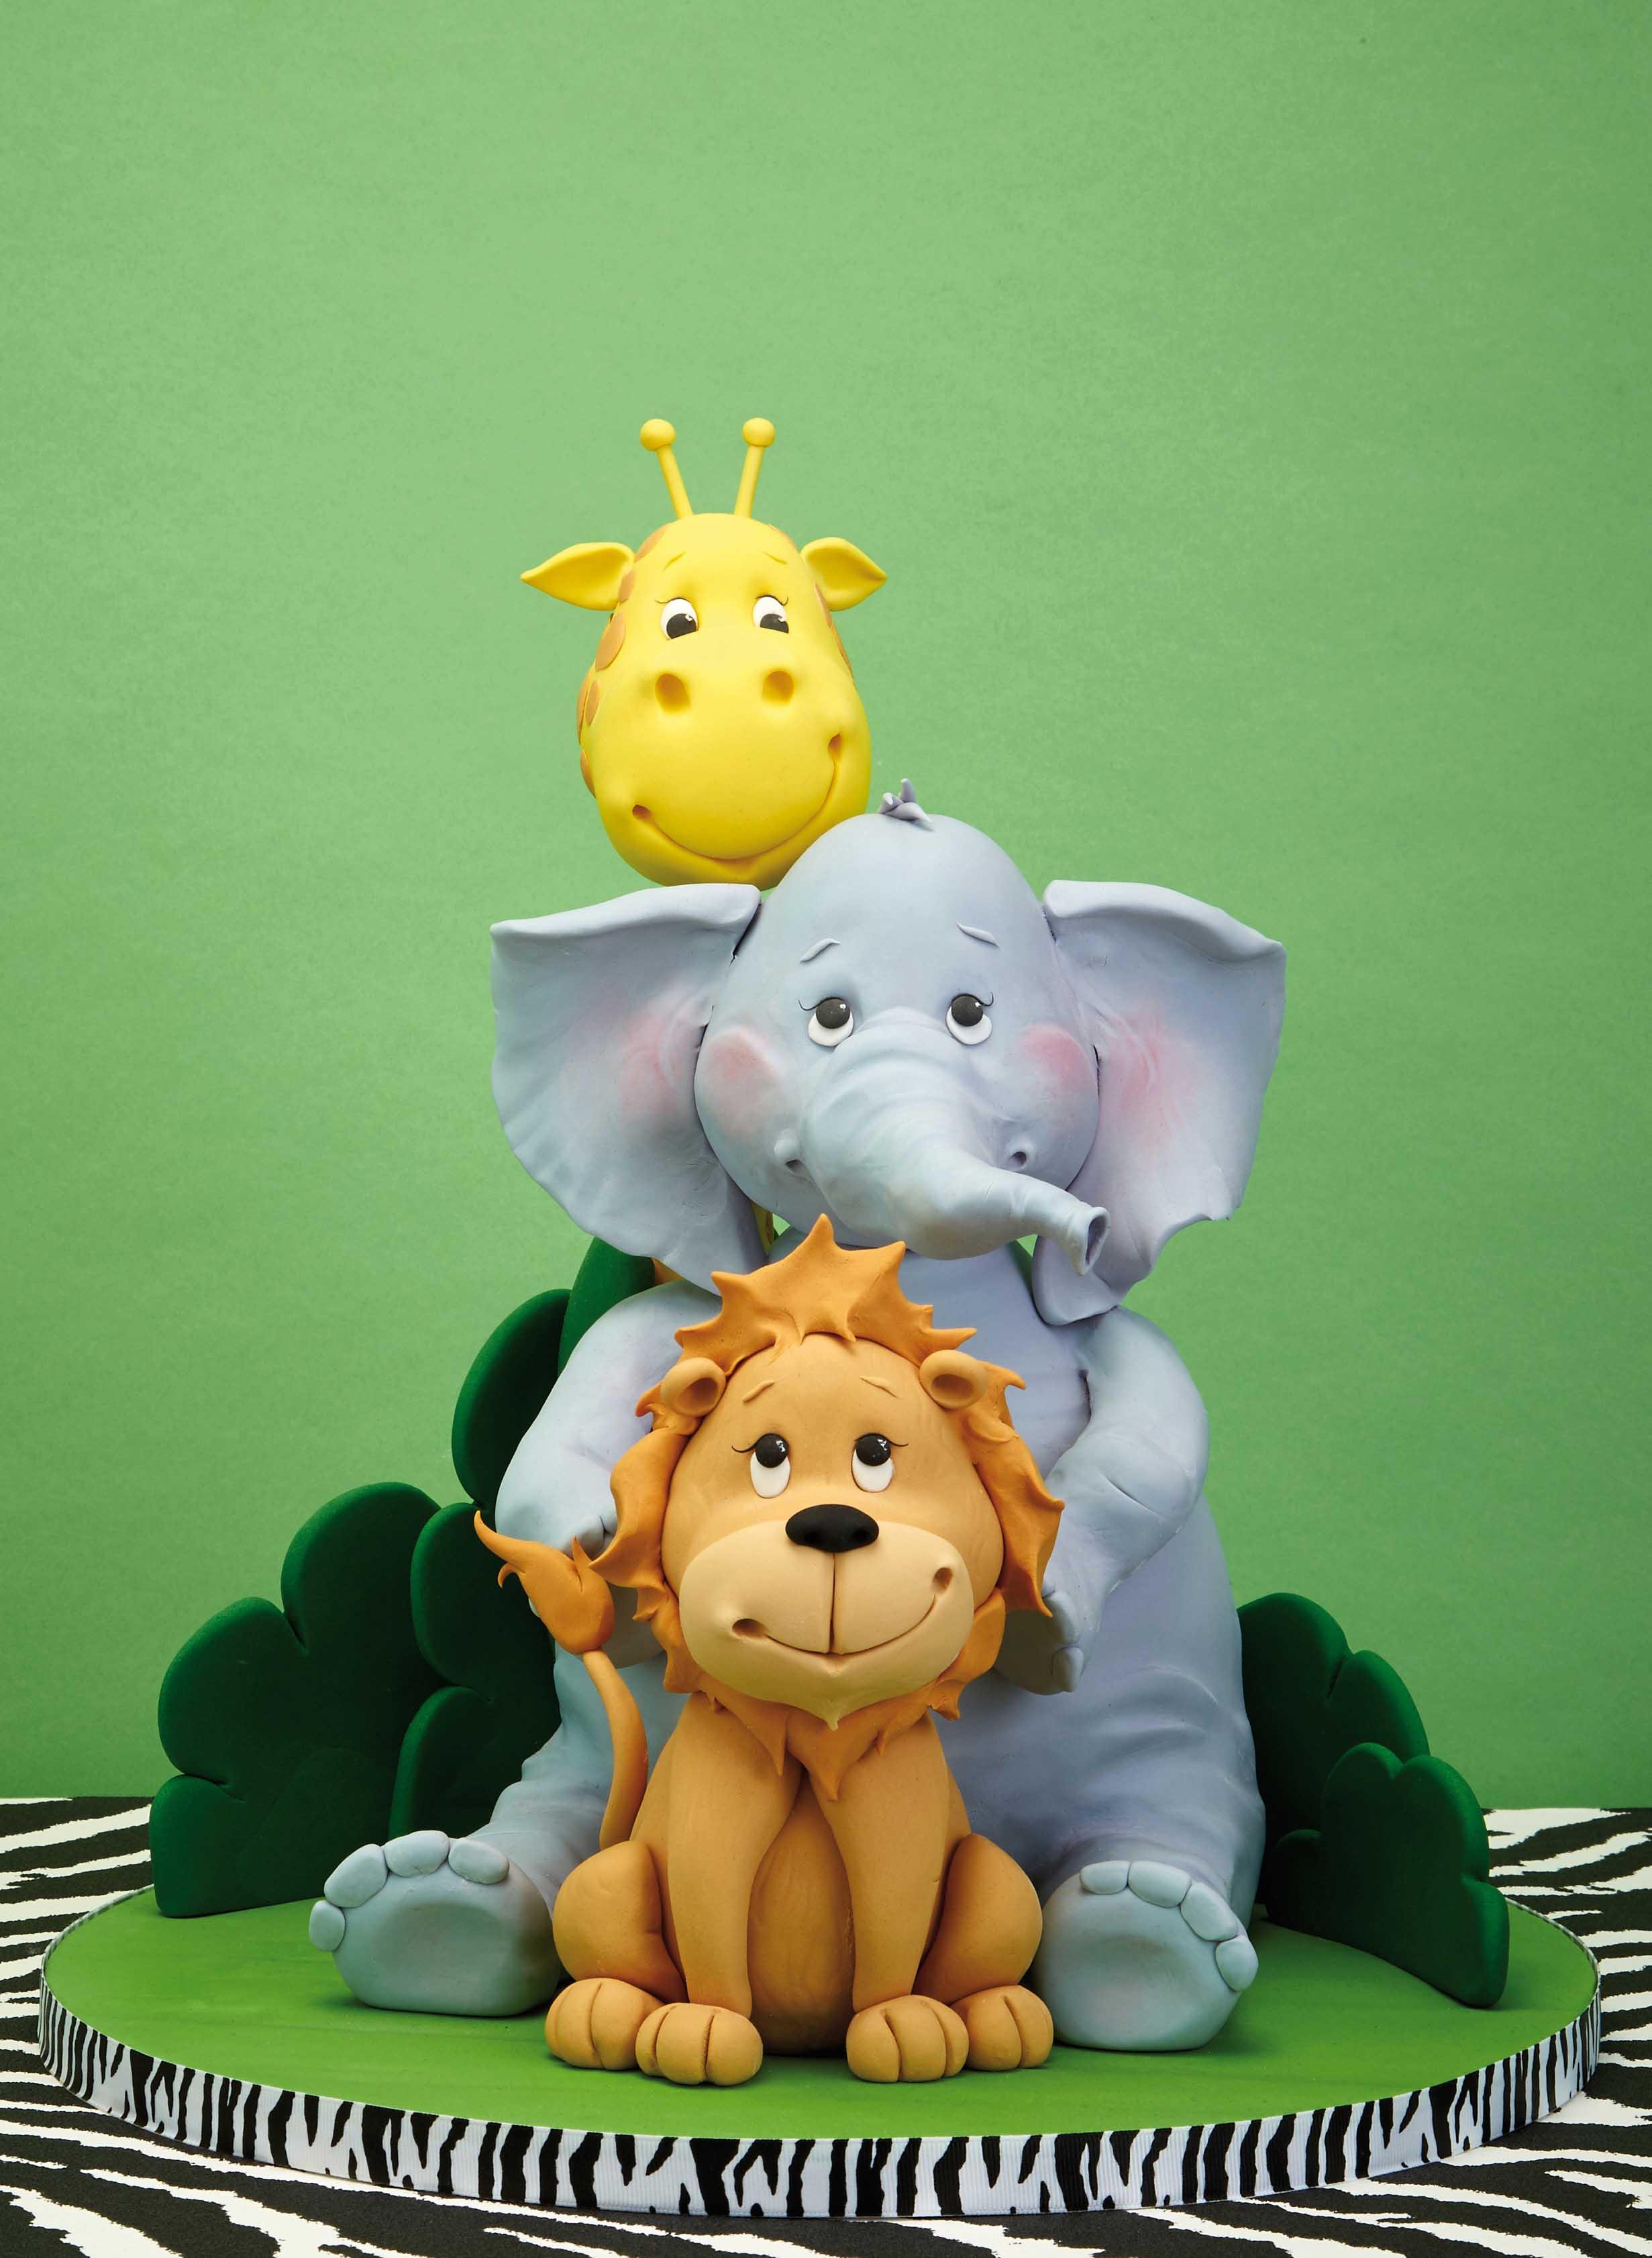 Fondant Safari figurines